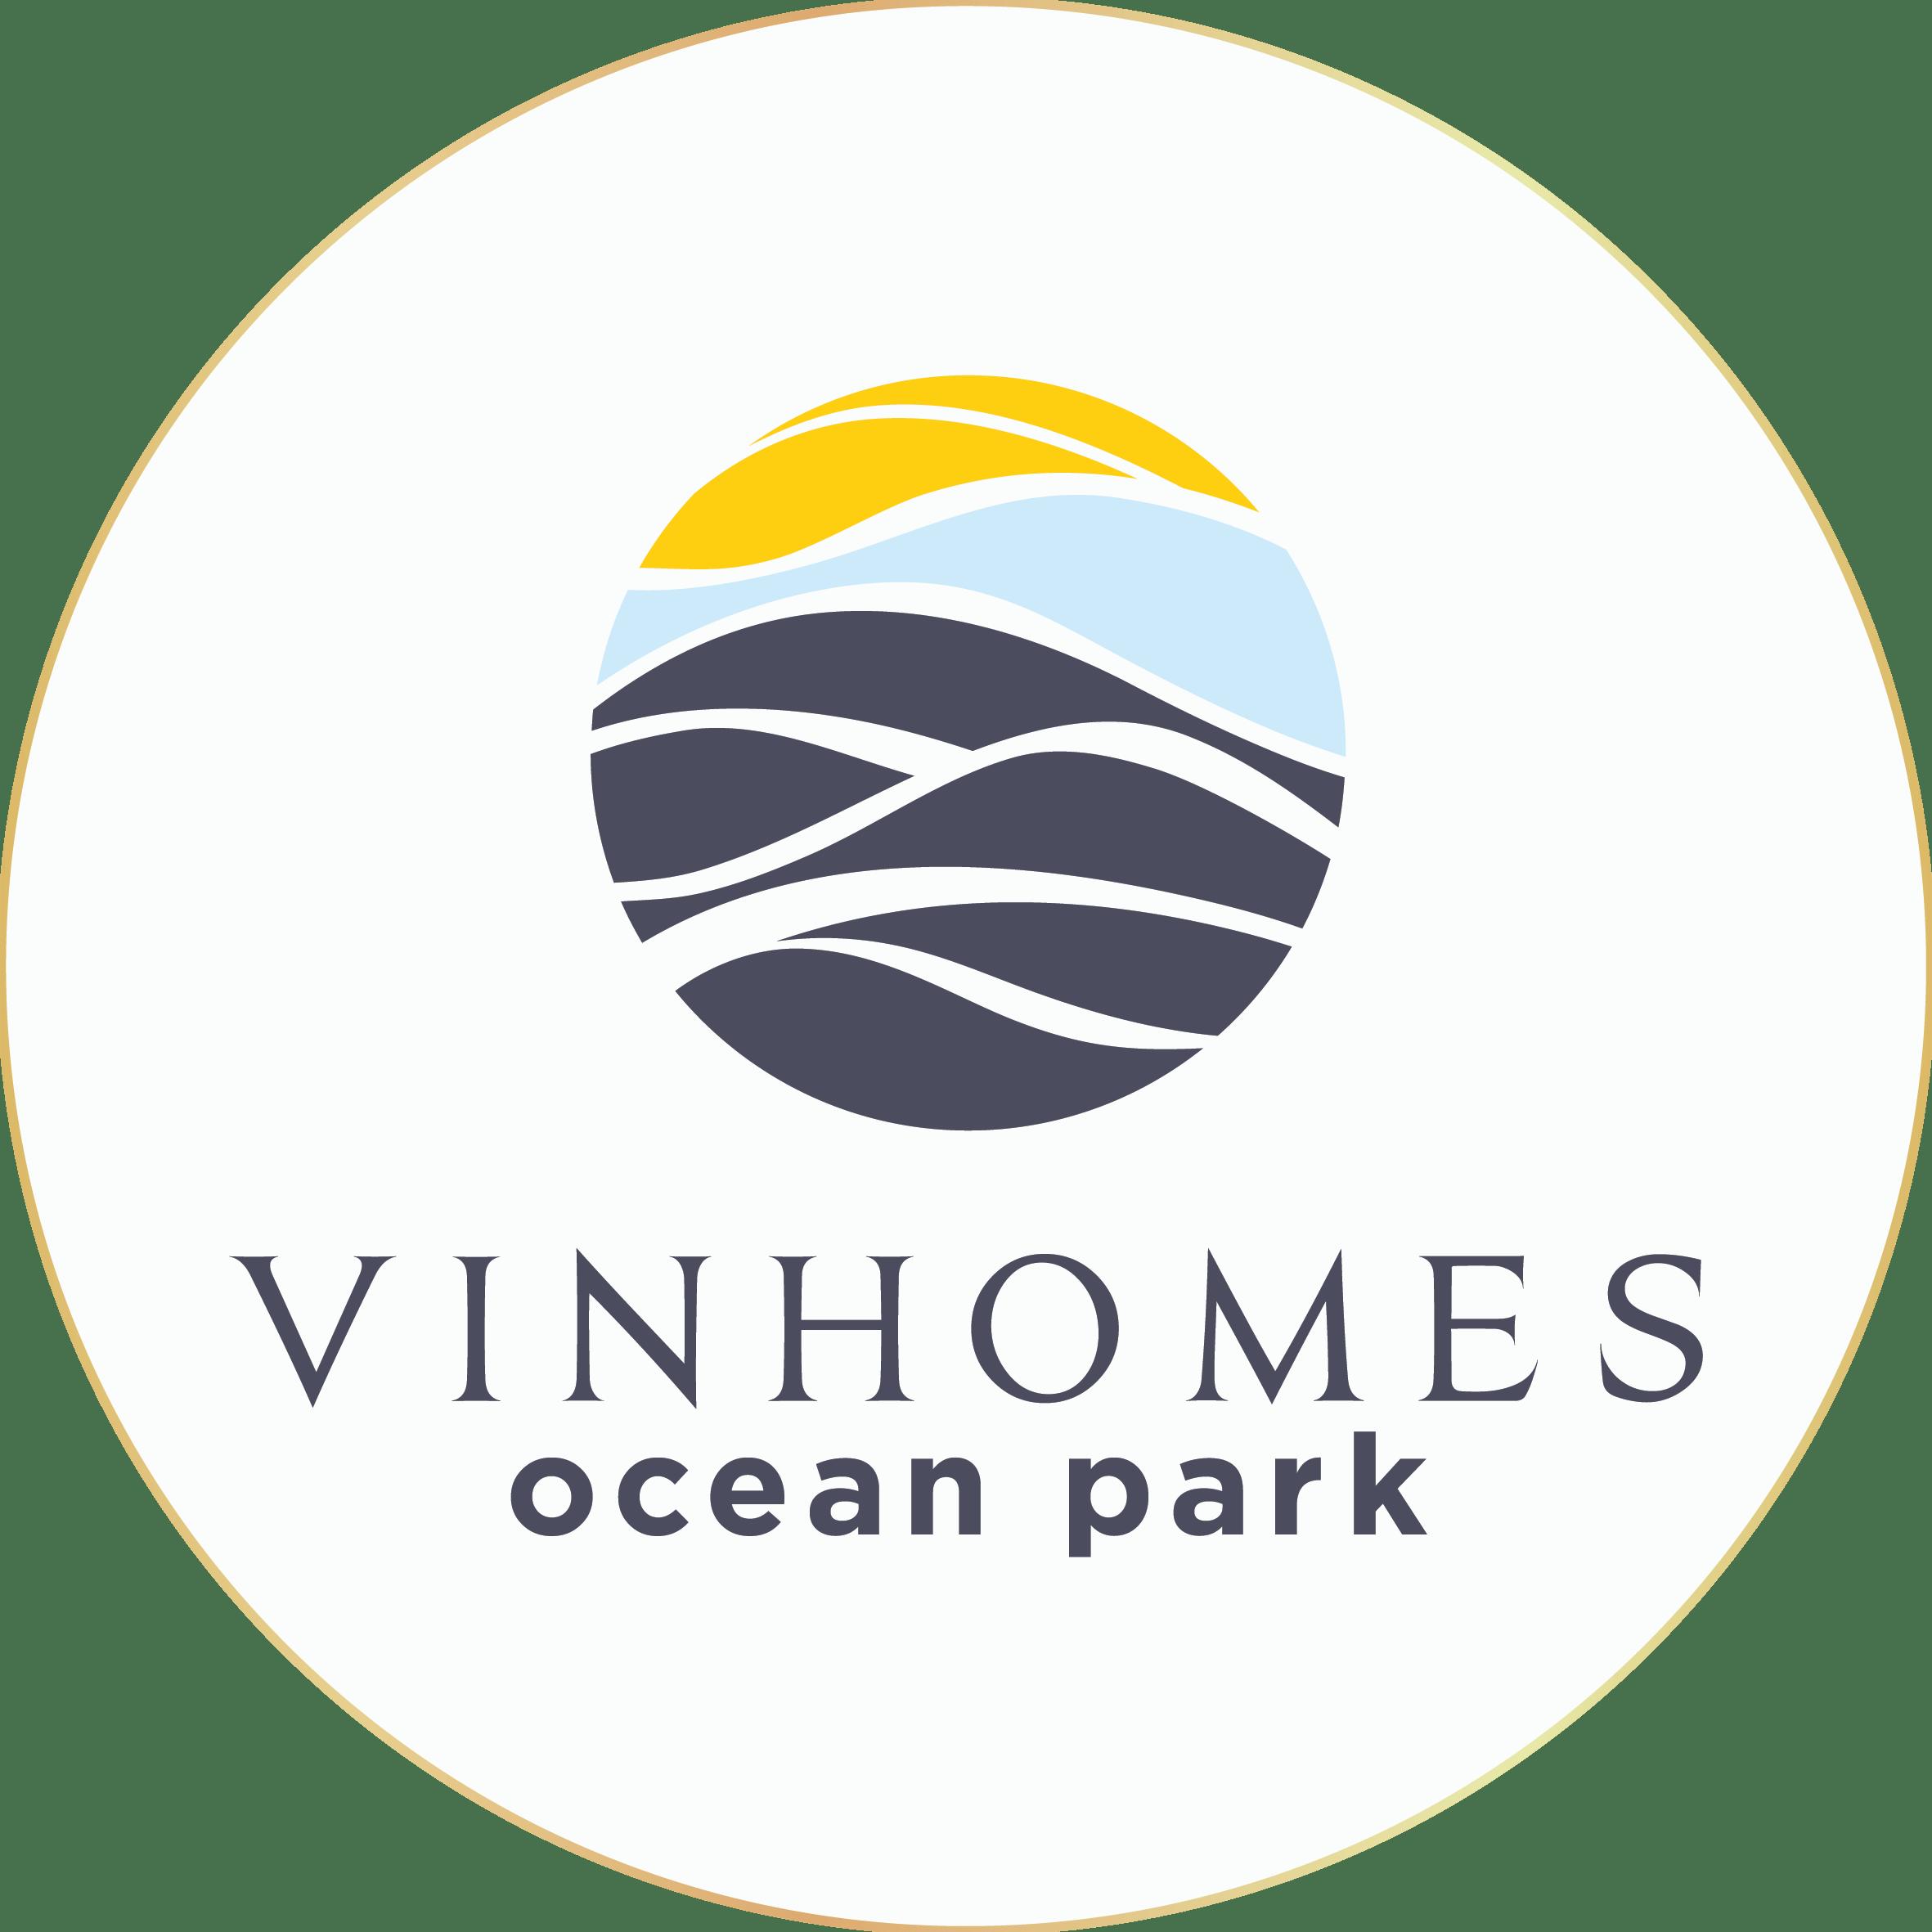 vinhomes-ocean-park-gia-lam-logo